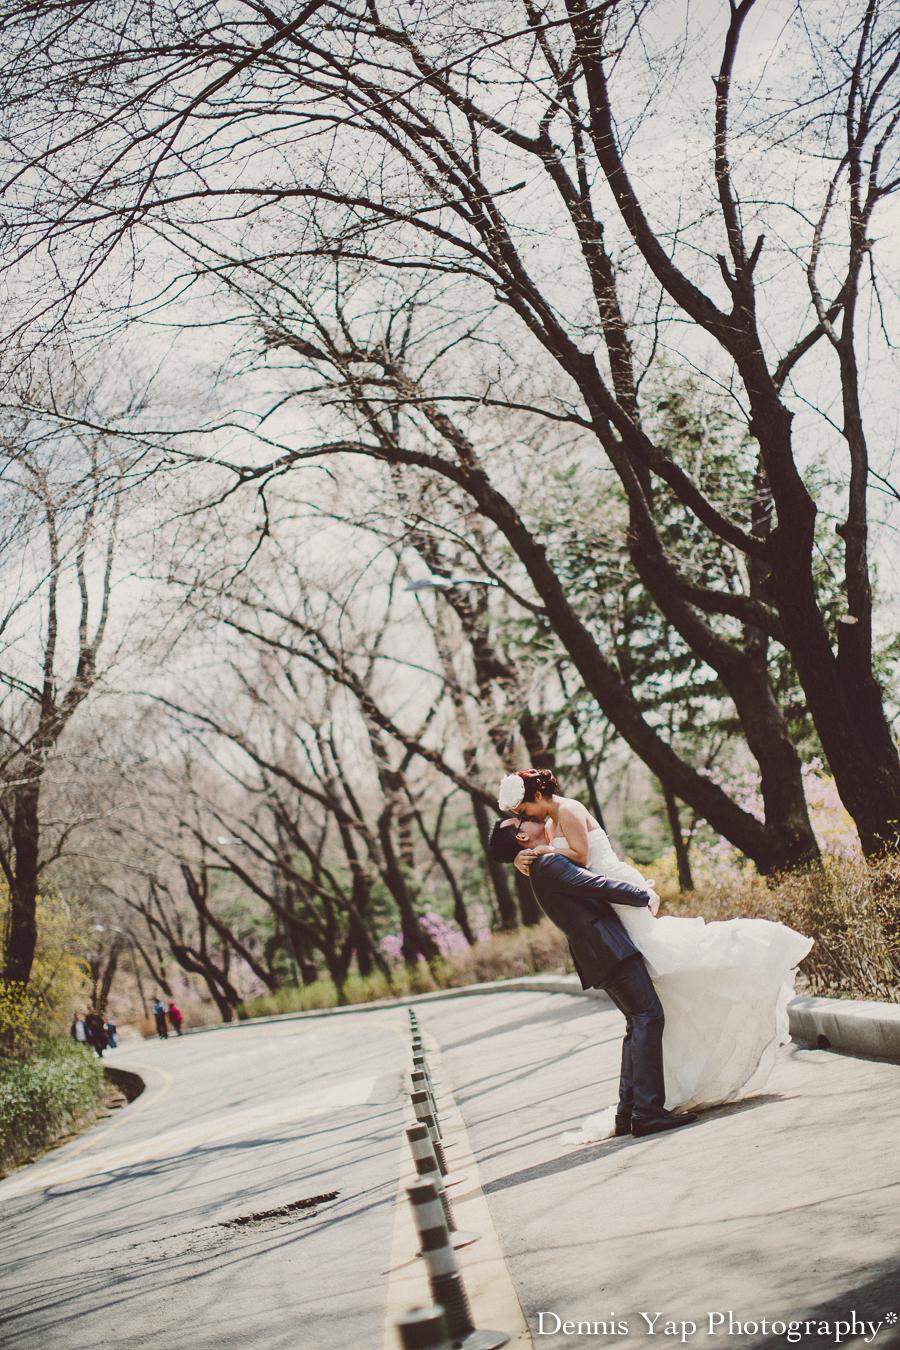 winson wawa dennis yap photography malaysia wedding photographer korea pre wedding seoul kyedong street myeongdong namsan-5.jpg